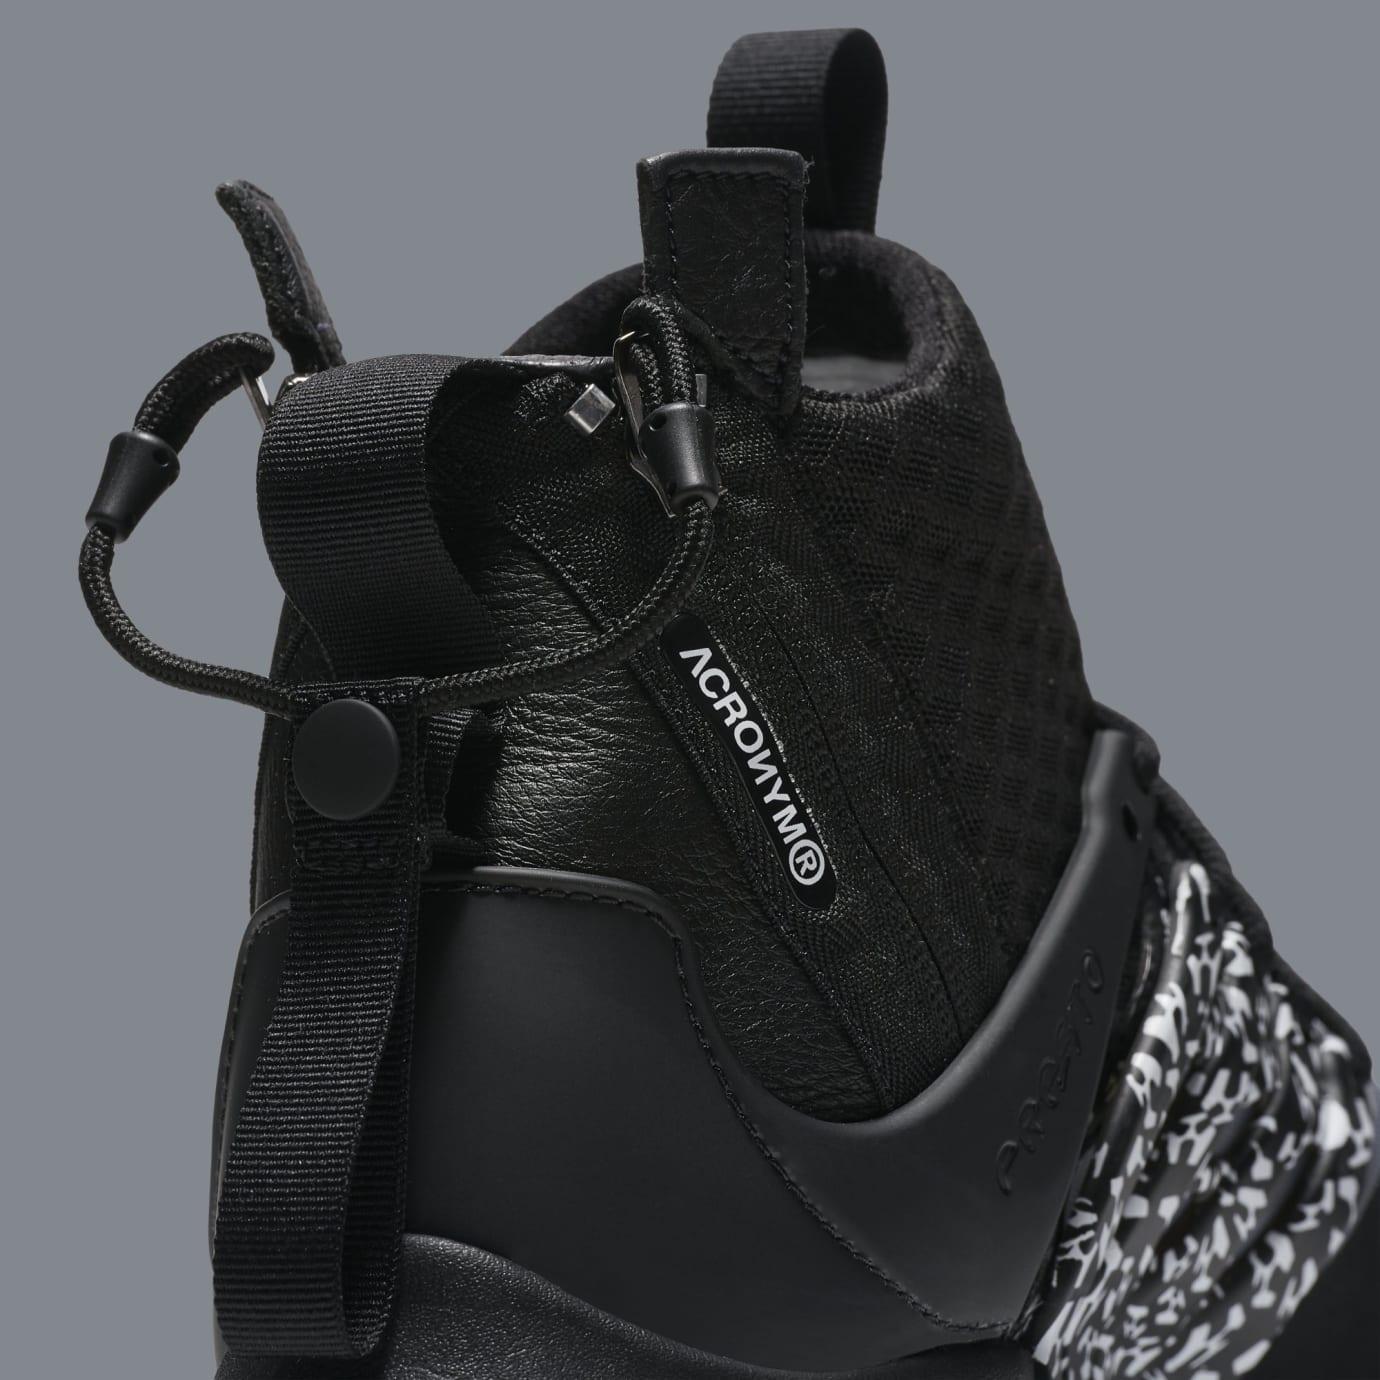 Acronym x Nike Air Presto Mid 'Cool Grey/Black' AH7832-001 (Detail)